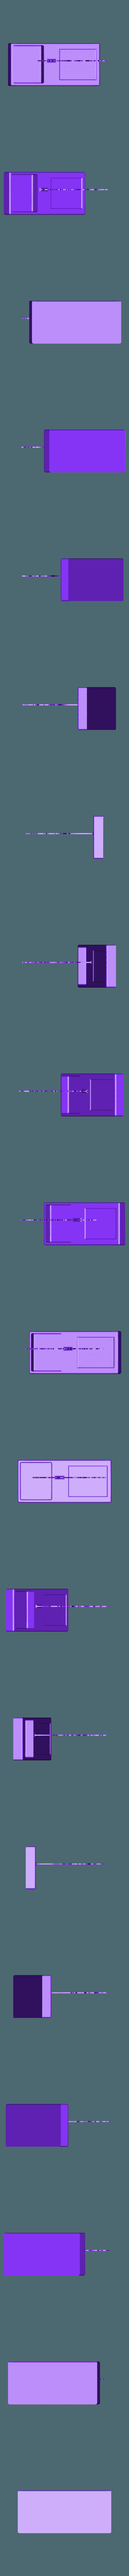 Arbol para collares.stl Download free STL file Tree Necklace Hanger • 3D printer template, CastleDesignChile